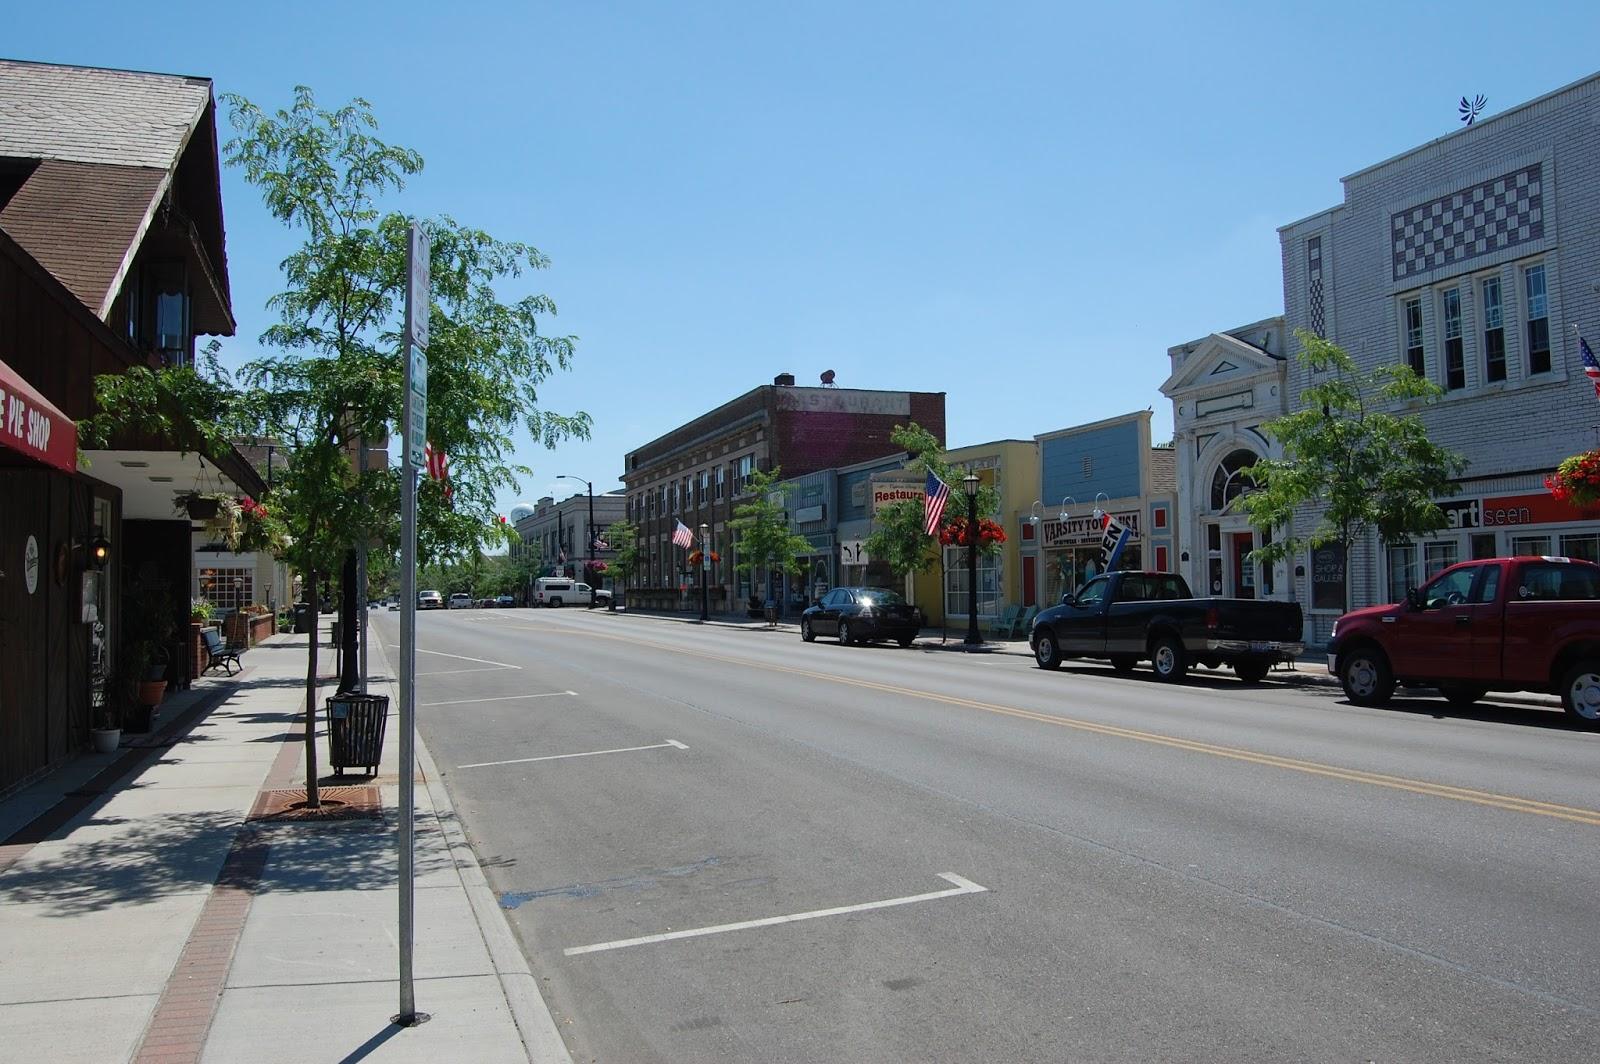 Ohio erie county vermilion - Downtown Vermilion Ohio